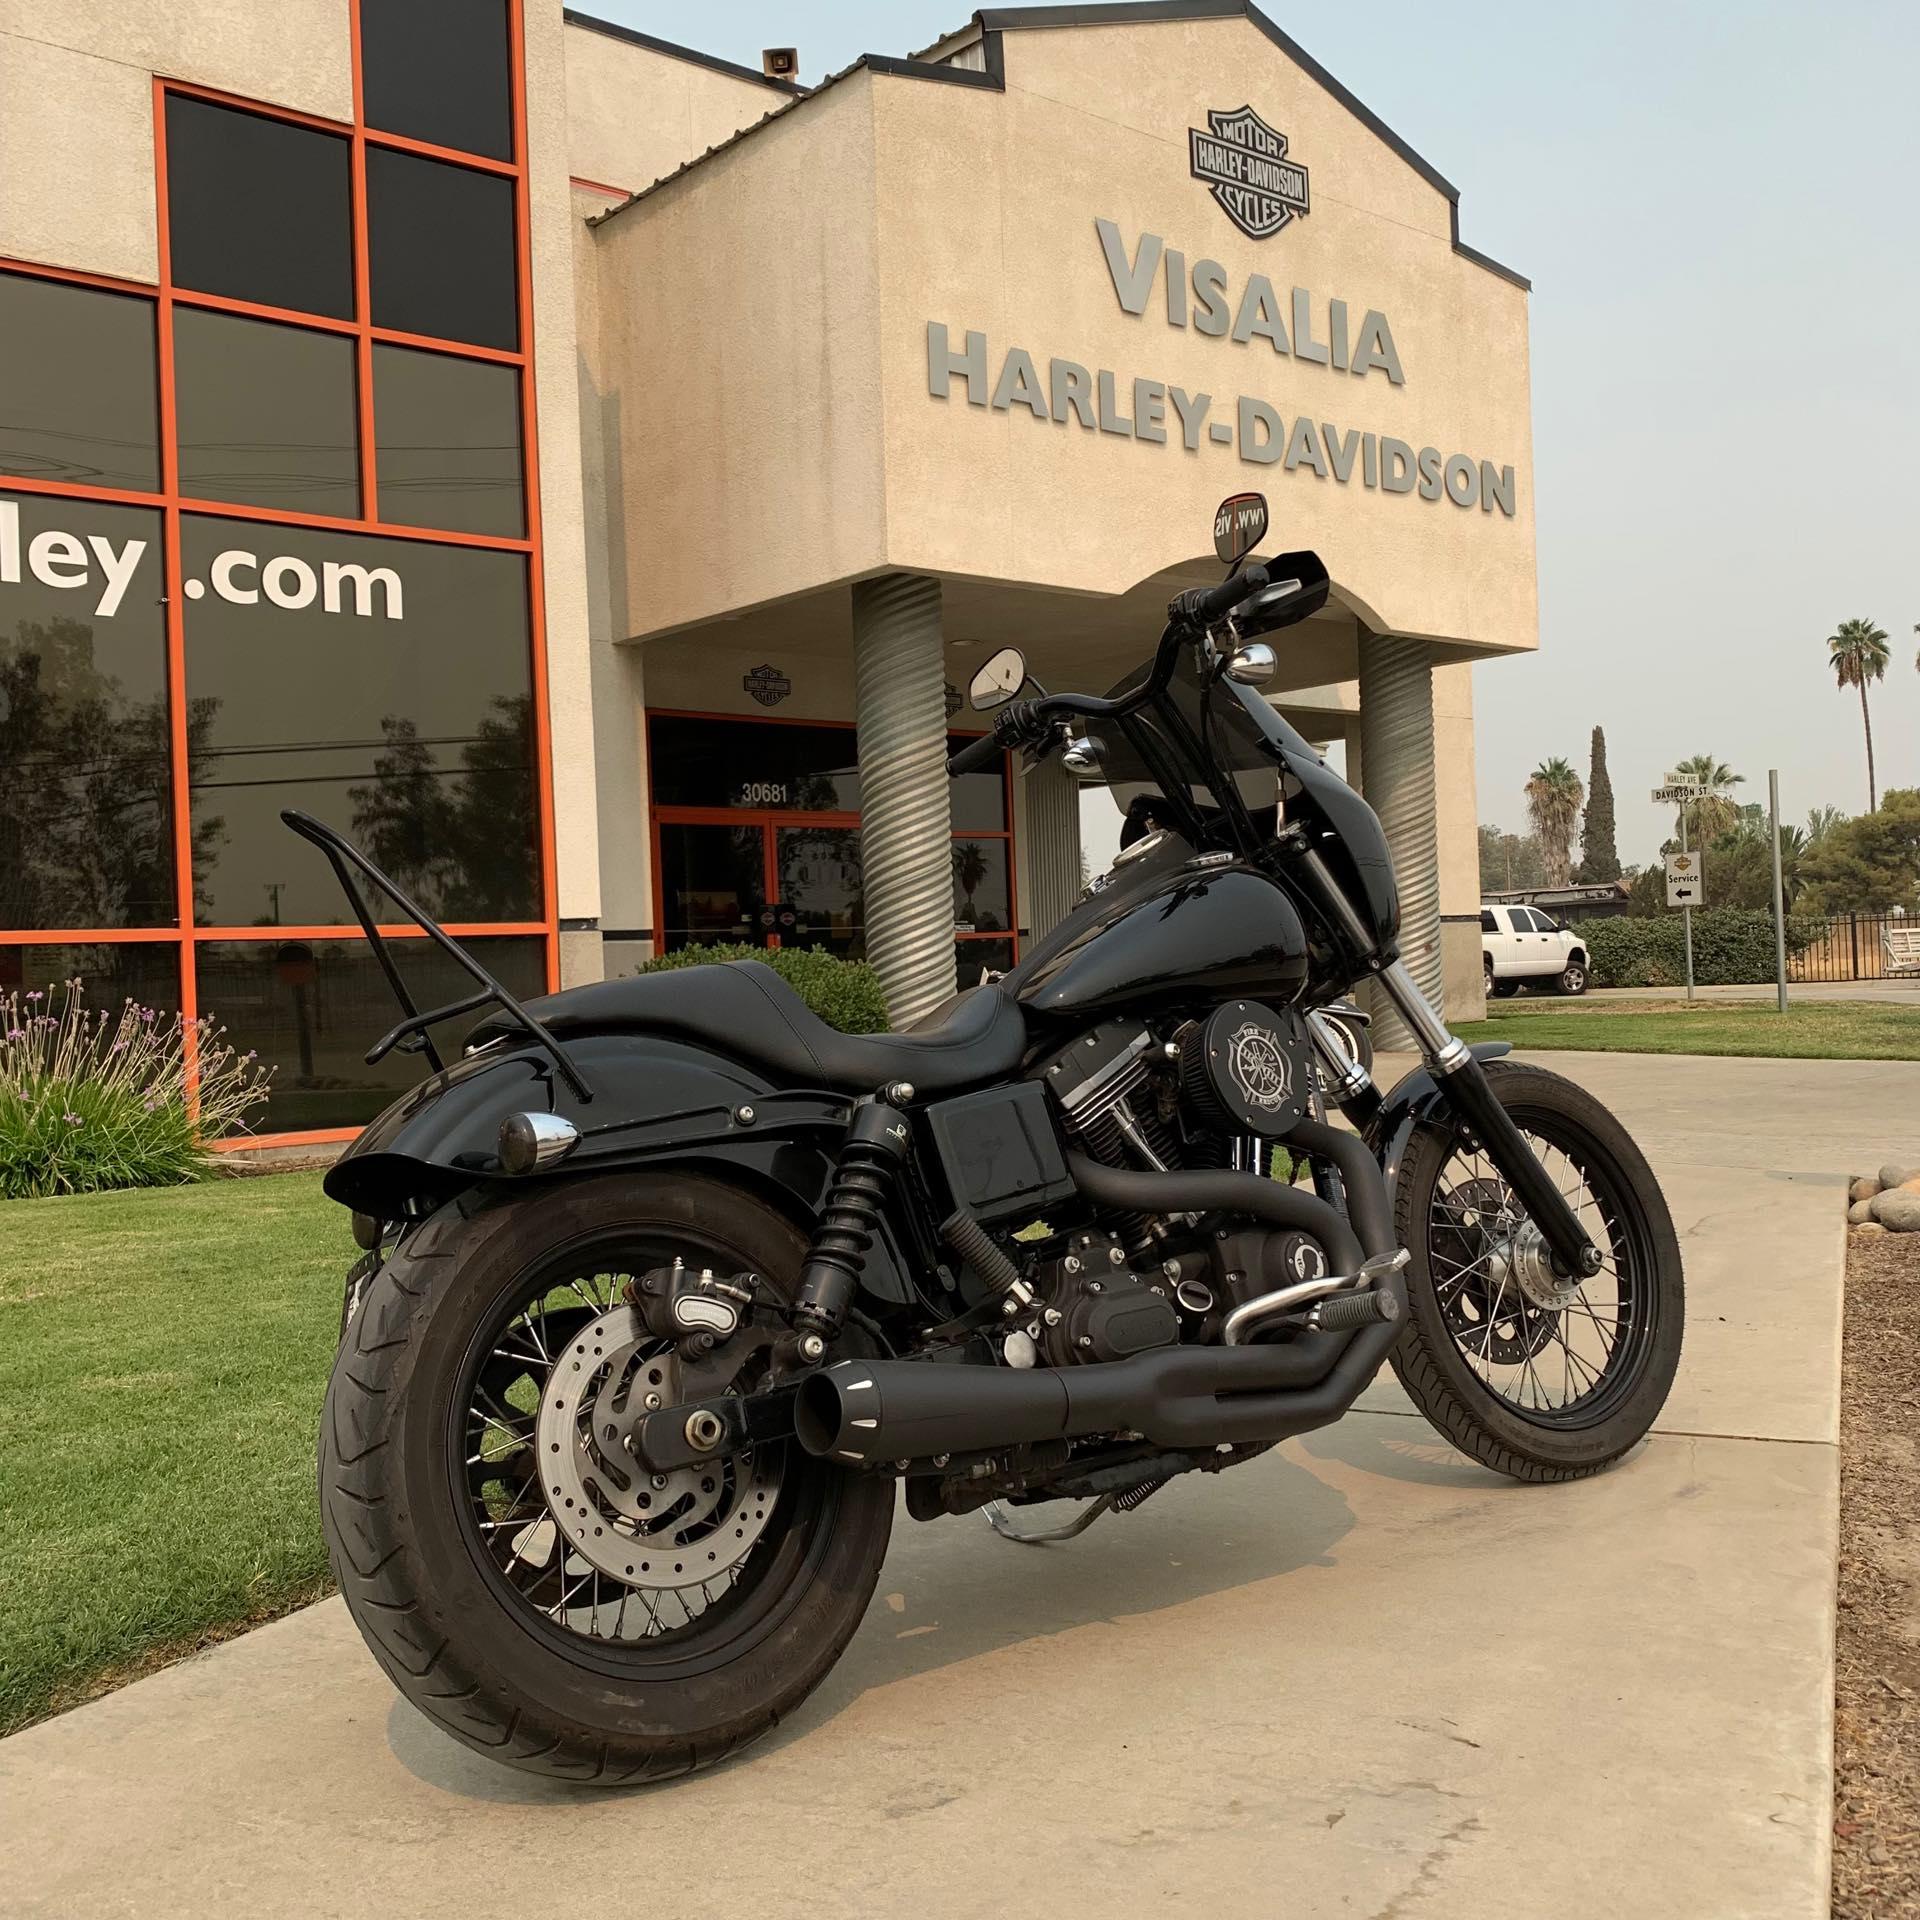 2015 Harley-Davidson Dyna Street Bob at Visalia Harley-Davidson